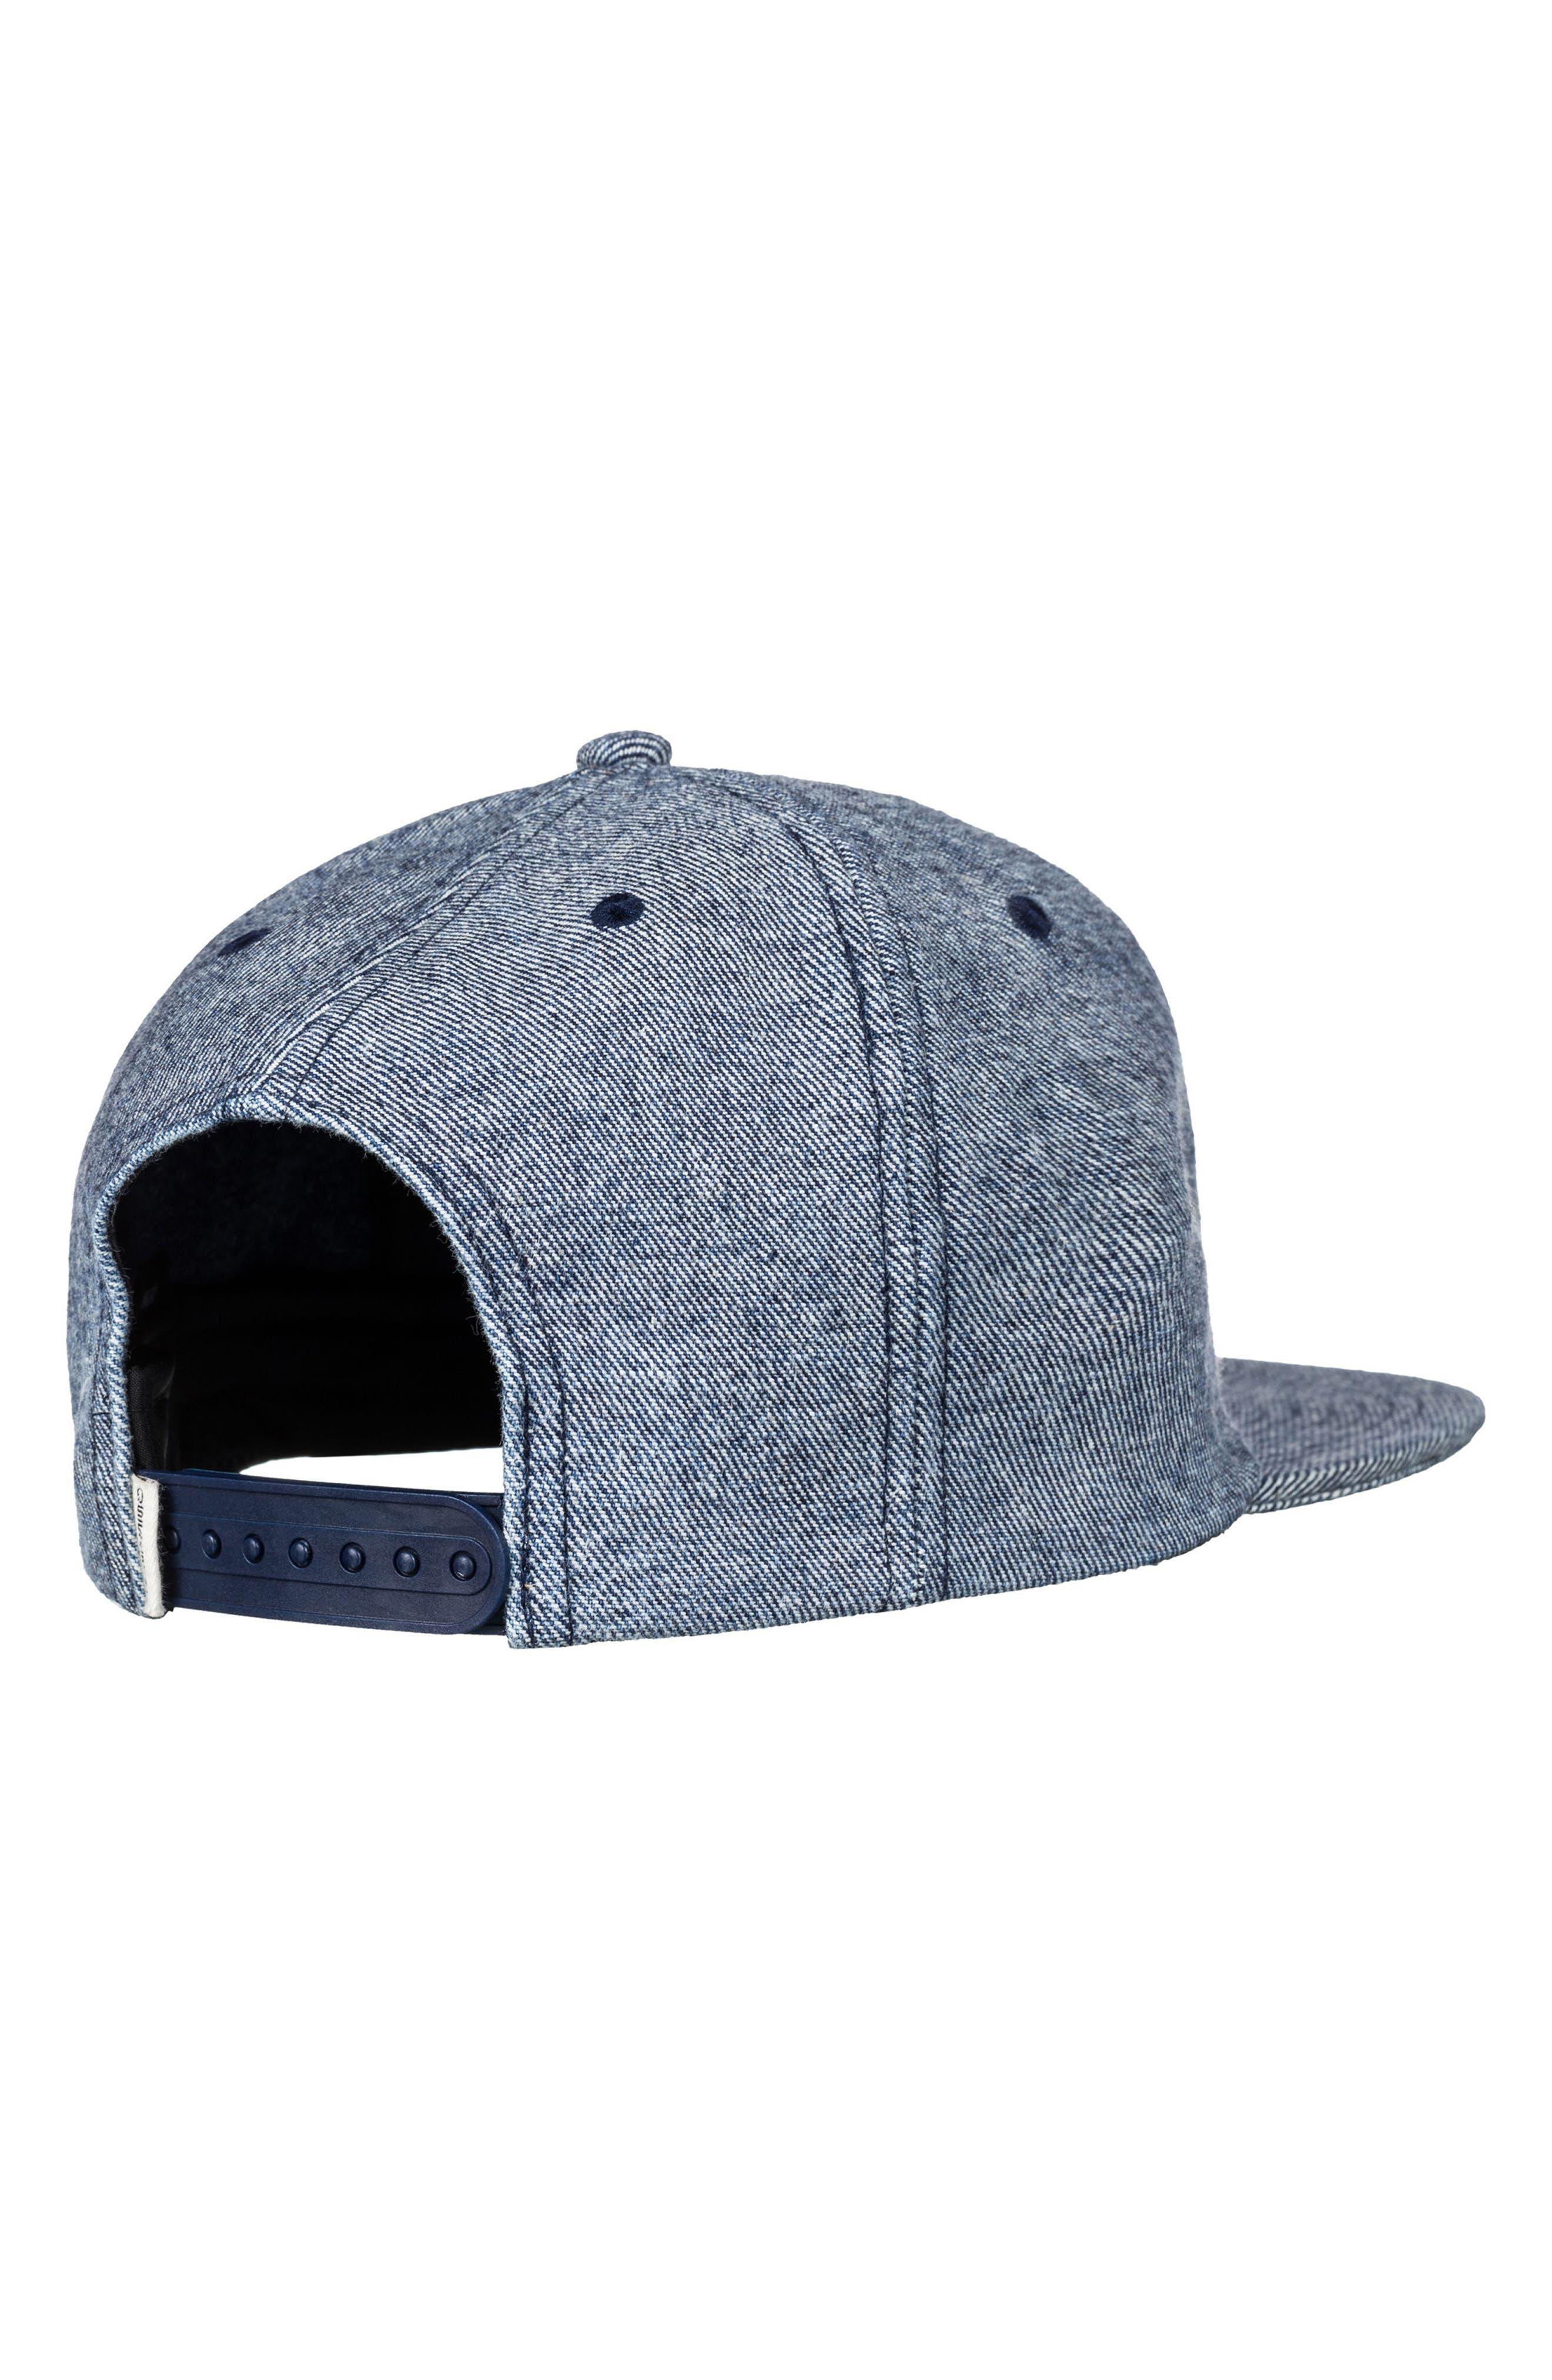 Pinchfield Snapback Baseball Cap,                             Alternate thumbnail 2, color,                             427